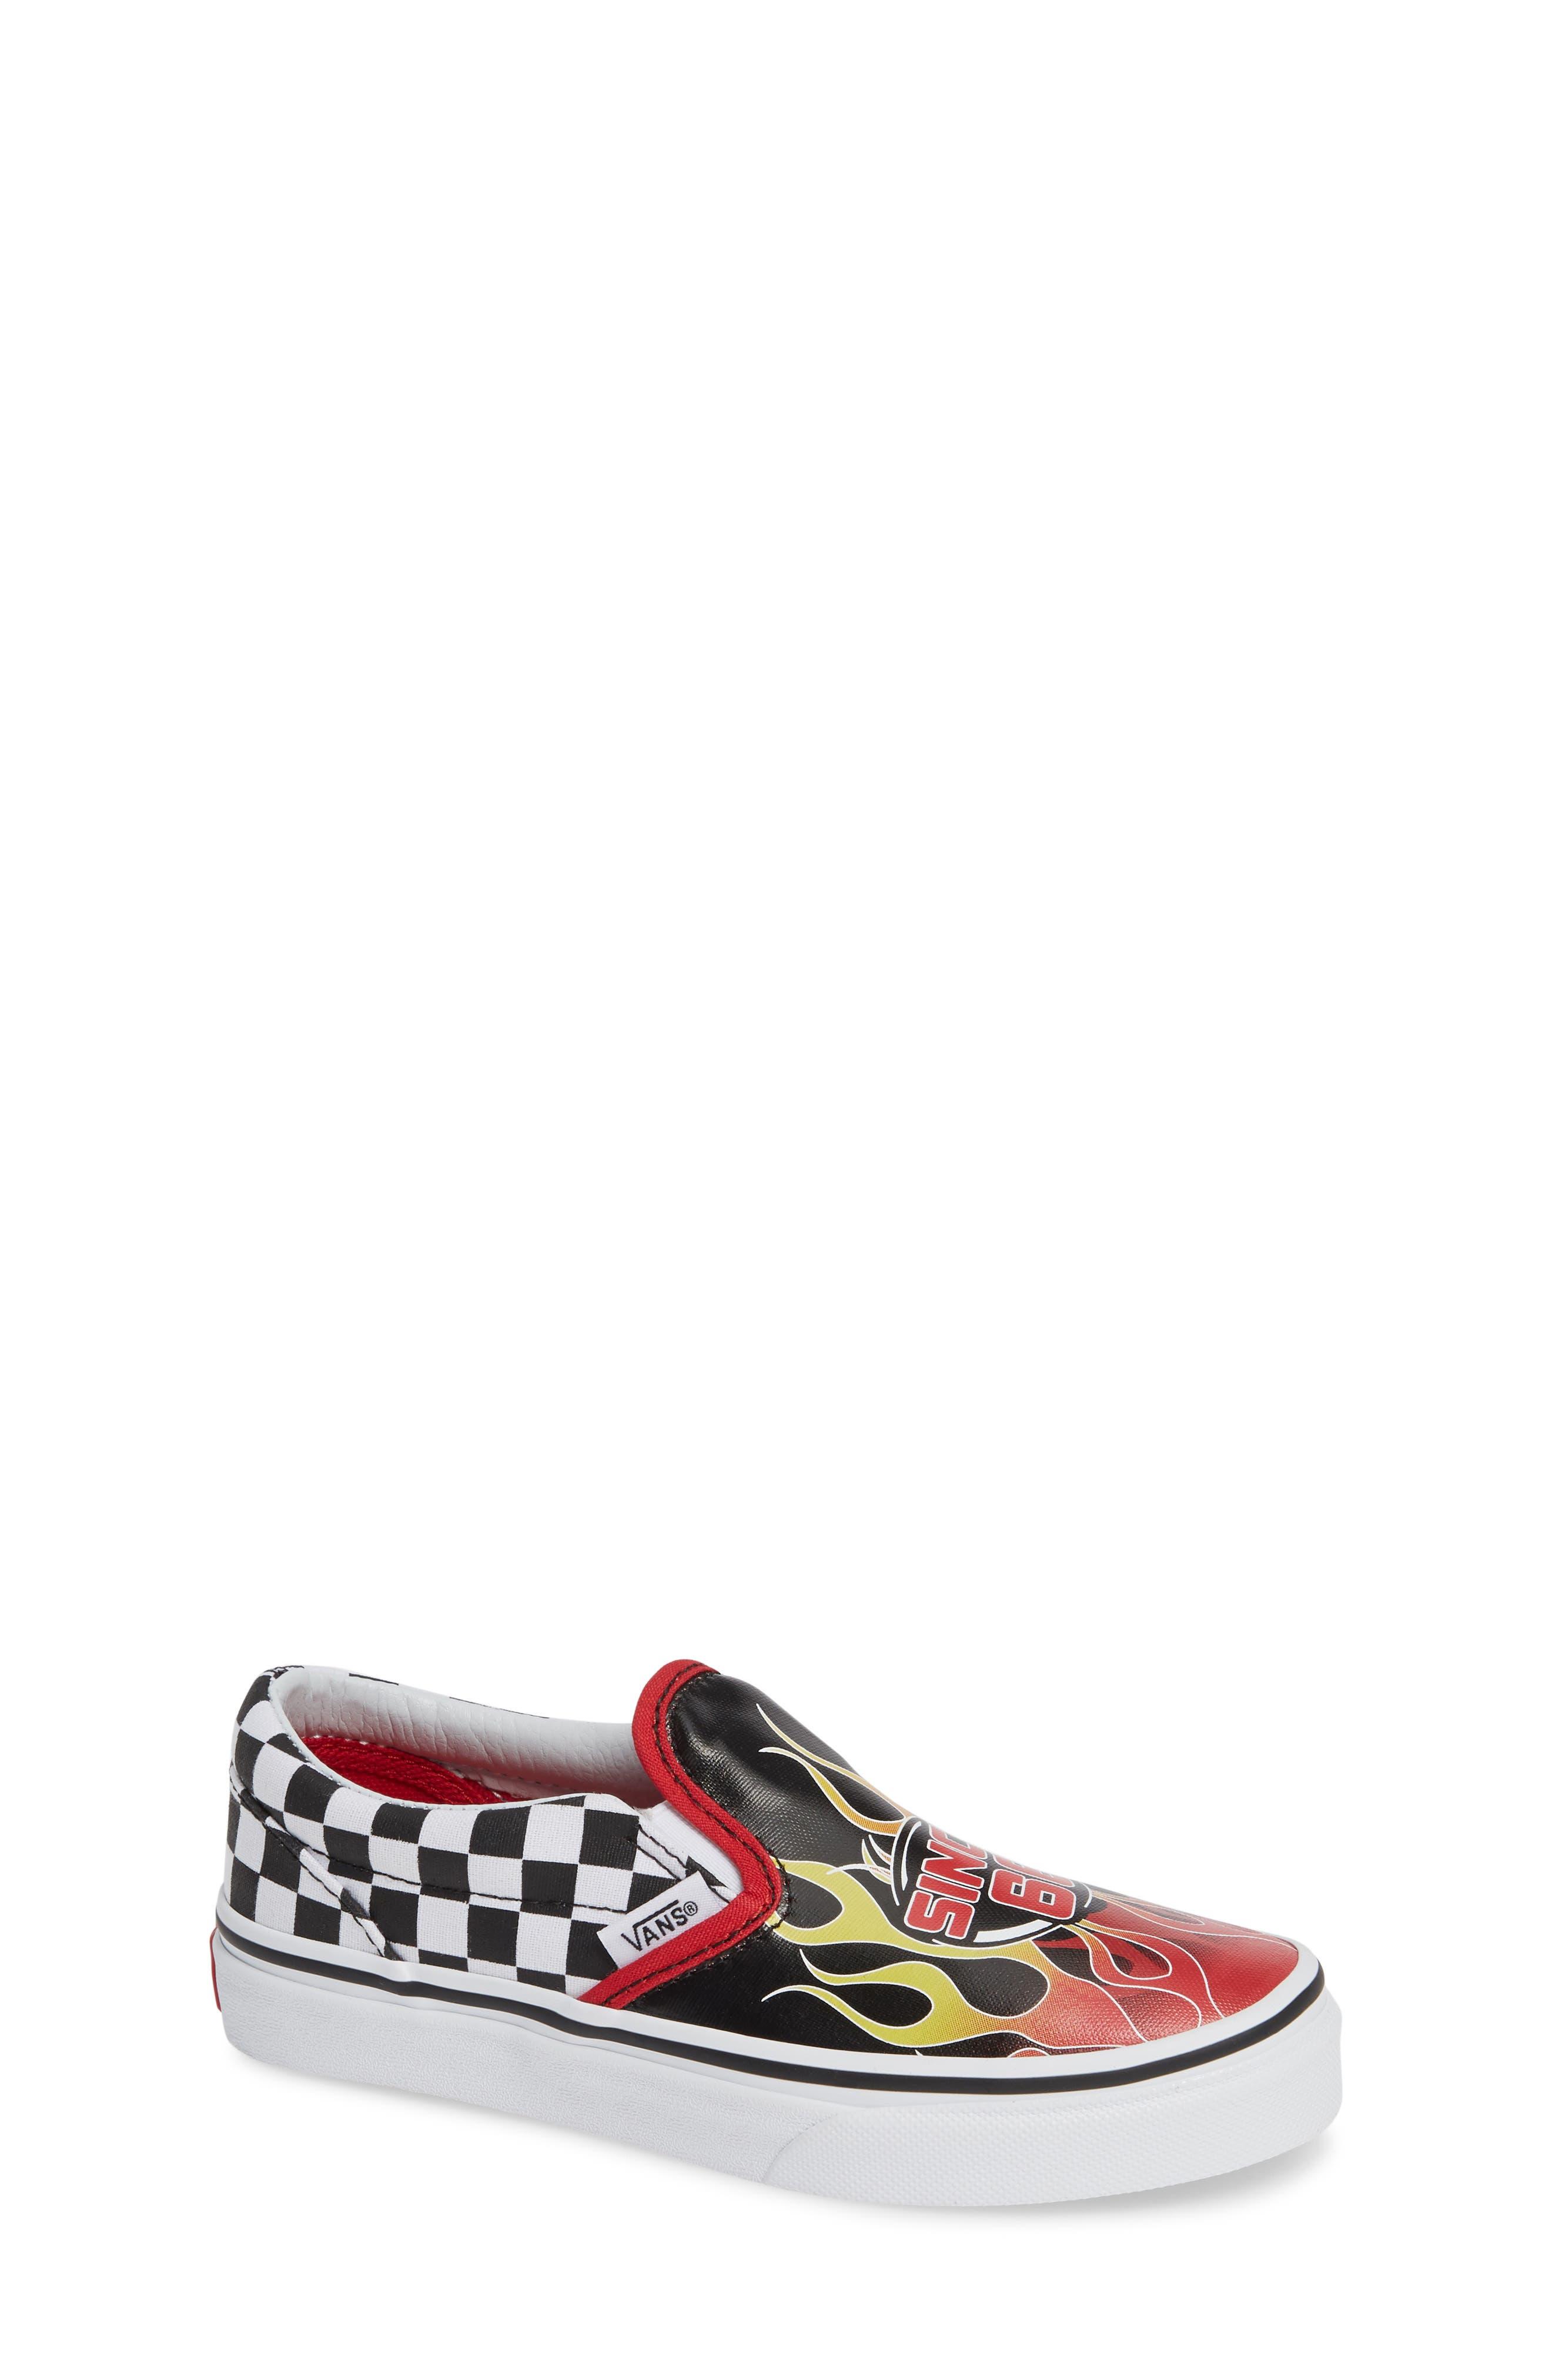 VANS,                             'Classic - Checker' Slip-On,                             Main thumbnail 1, color,                             BLACK/ RACING RED/ TRUE WHITE